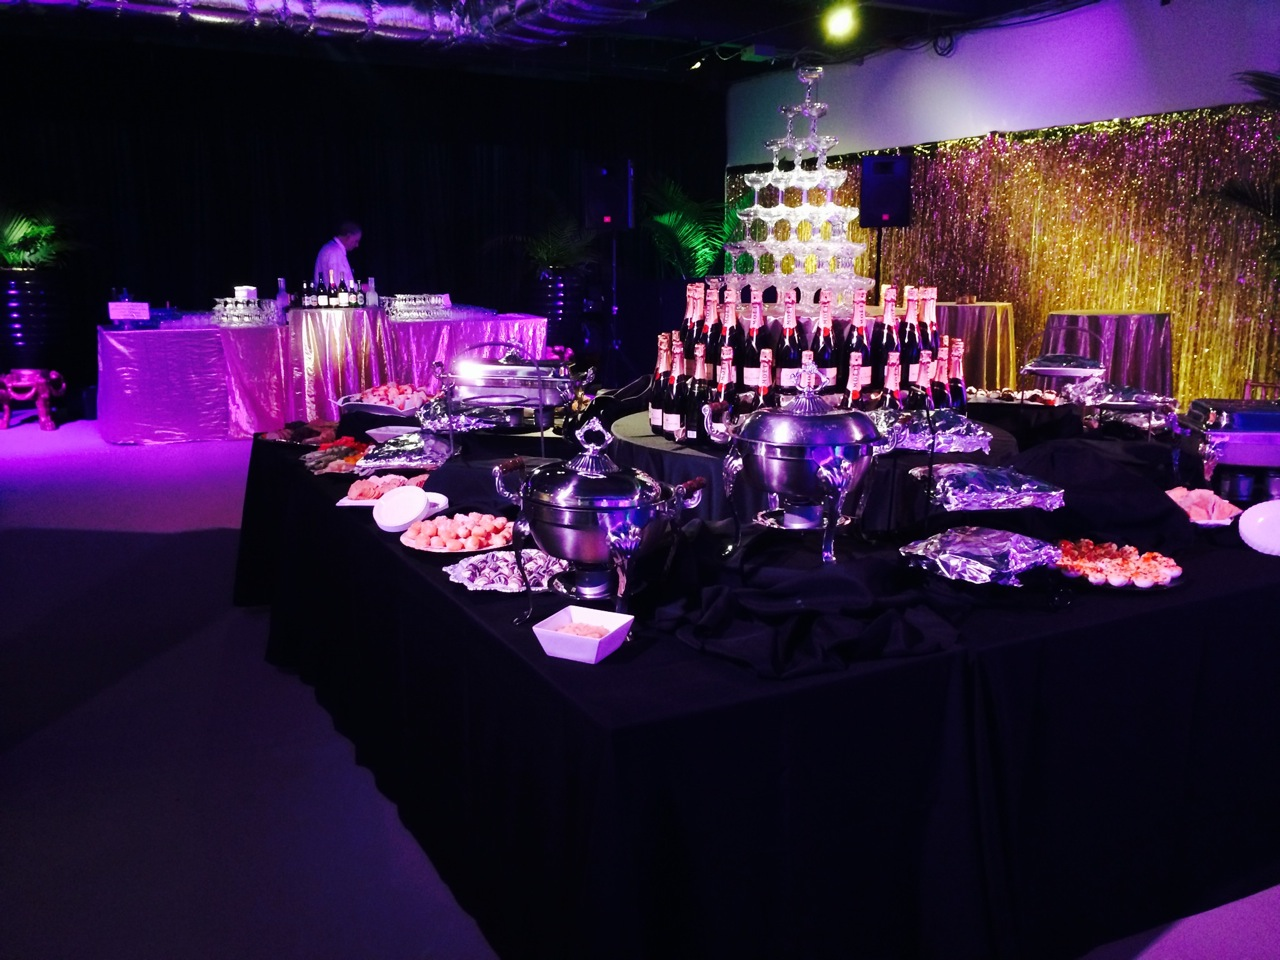 Great+Gatsby+Theme+-+Eggsotic+Events+NJ+NYC+Event+Decor+Design+Lighting+Room+Transformation+Art+Deco+Speakeasy+The+Great+Gatsby+Decorations+and+Lighting+7.jpg